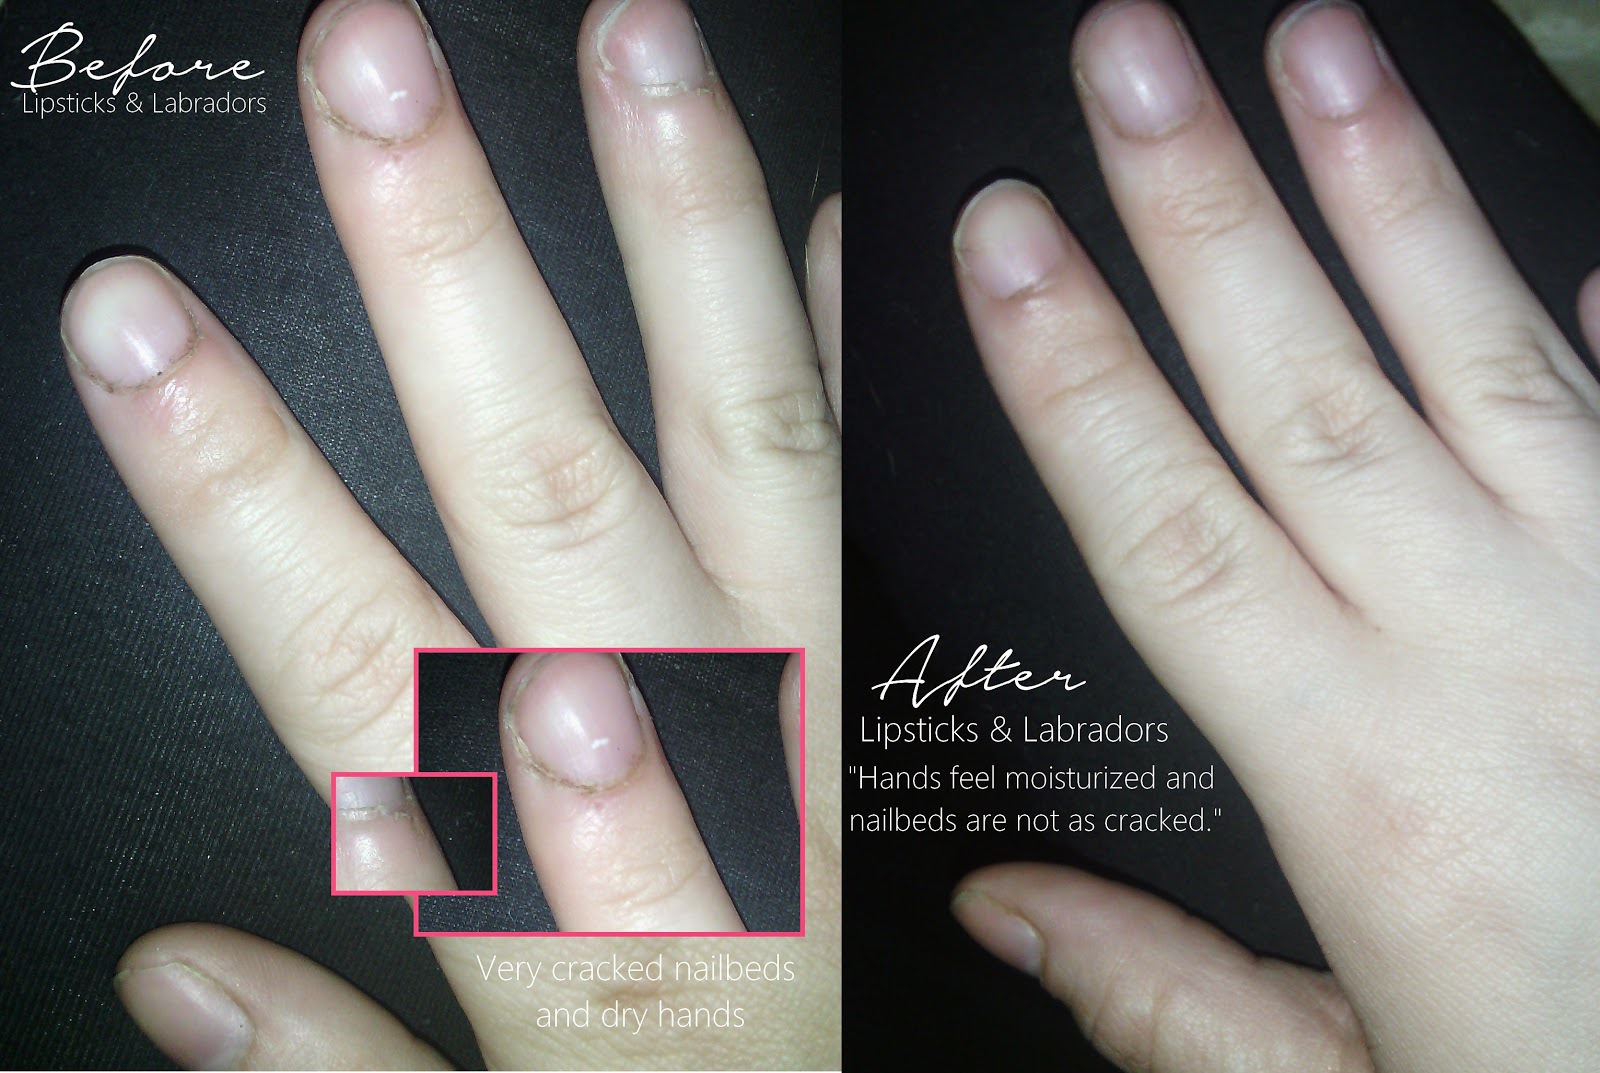 Female hand masturbation